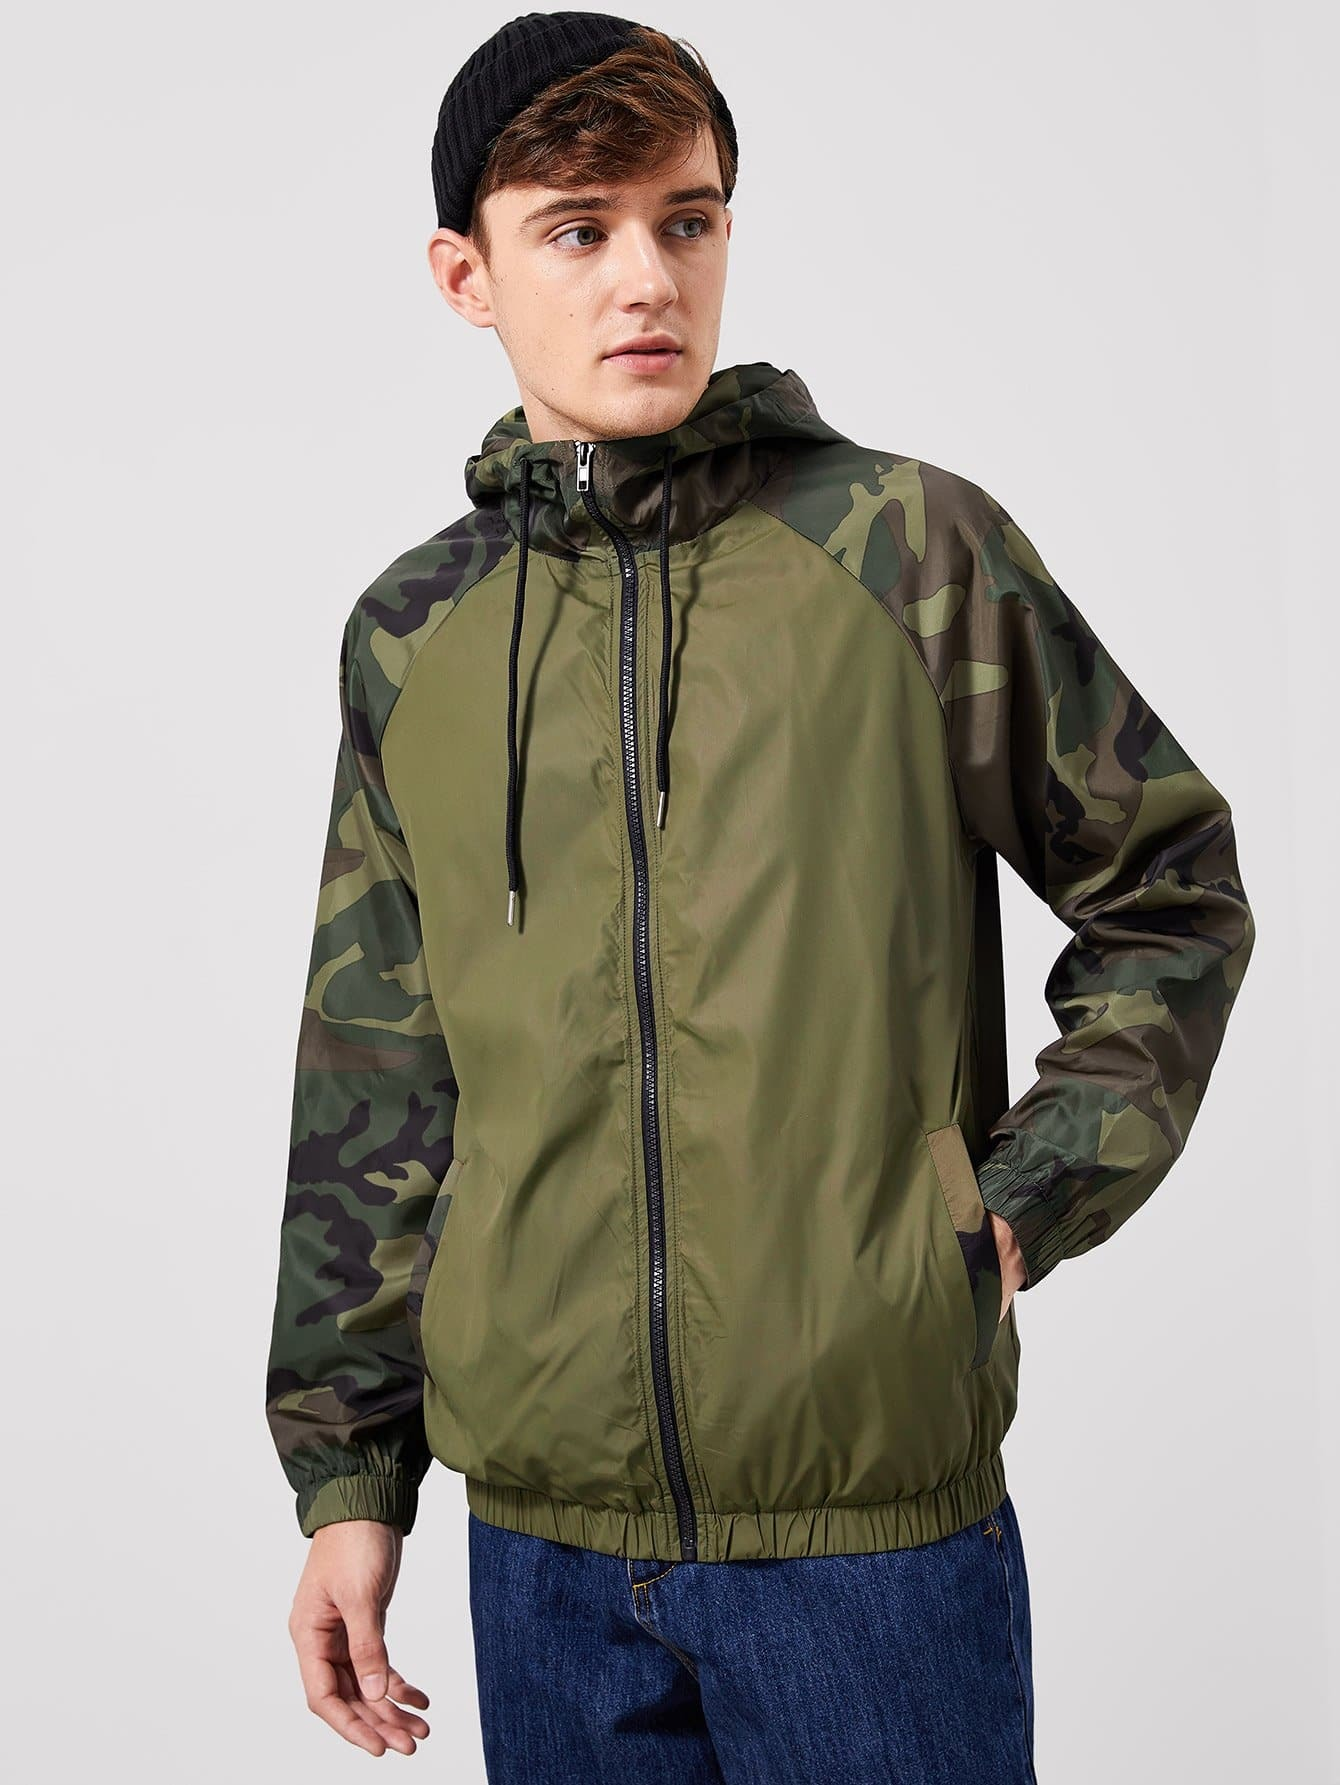 Фото - Для мужчин камуфляжная куртка с капюшоном на молнии от SheIn цвет цвета хаки